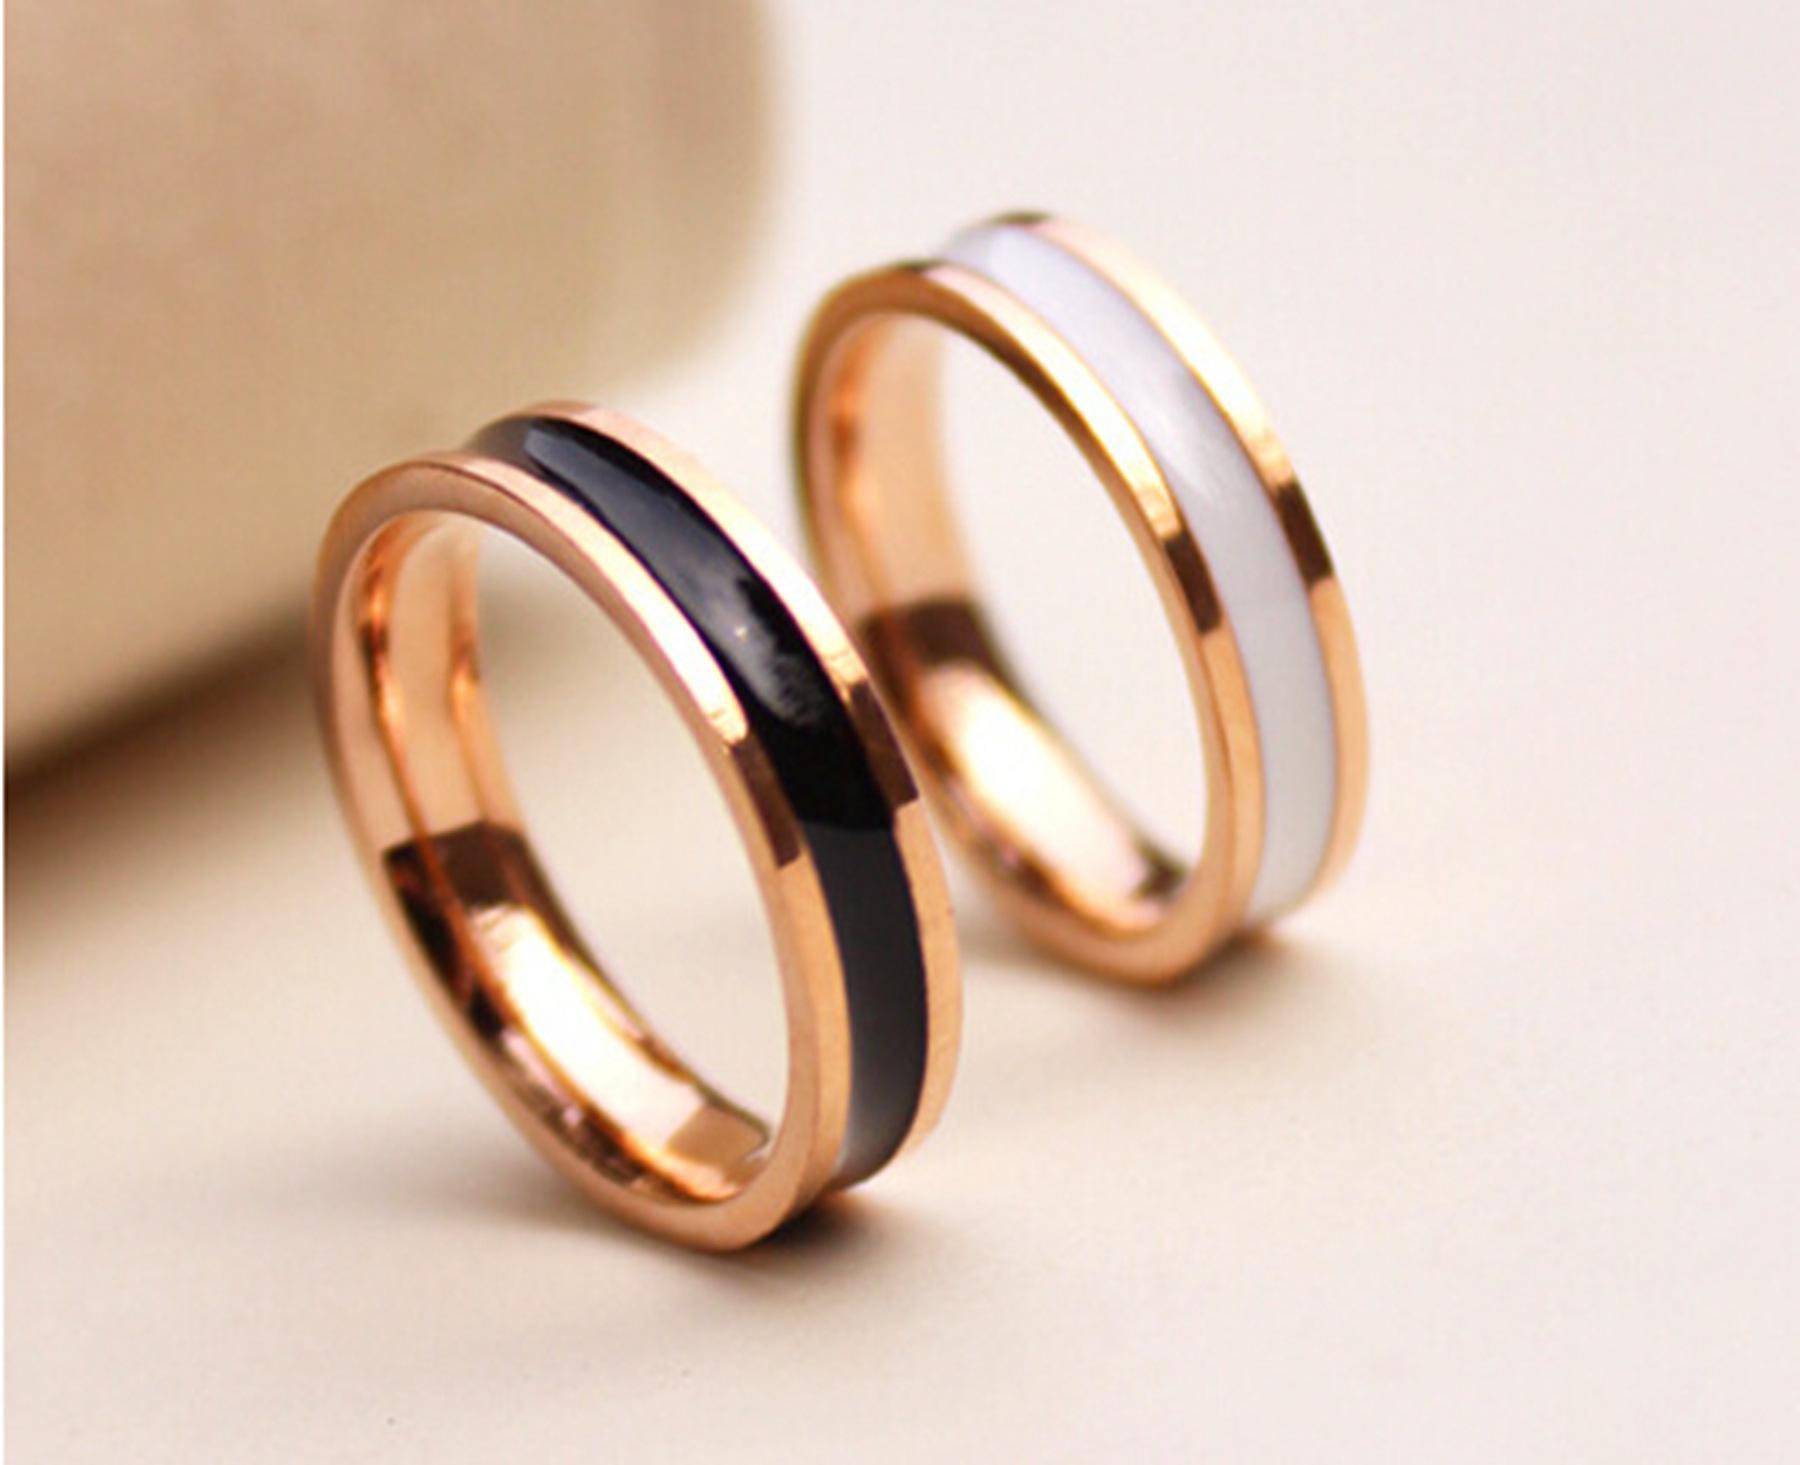 18K Roes gold Fashion Rings Little finger Rings Black White drop ...